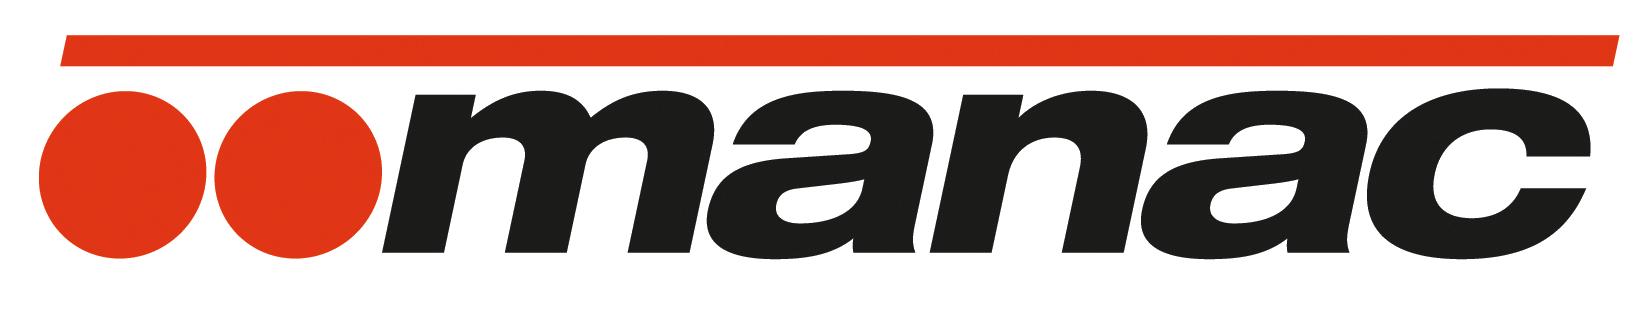 Manac Trailers USA, Inc.